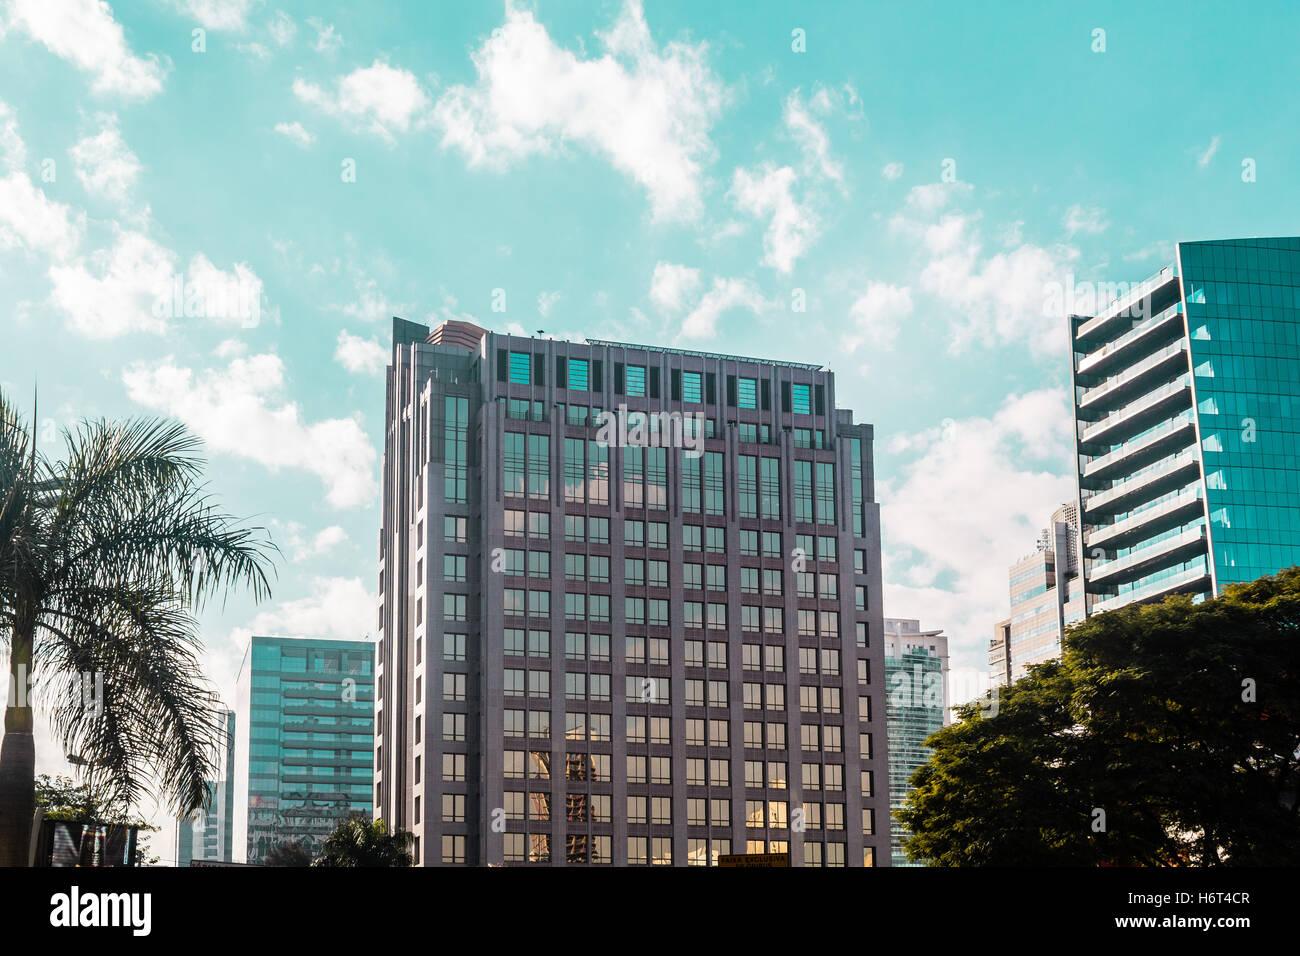 Photo of Buildings and Streets of Sao Paulo, Brazil (Brasil) Stock Photo